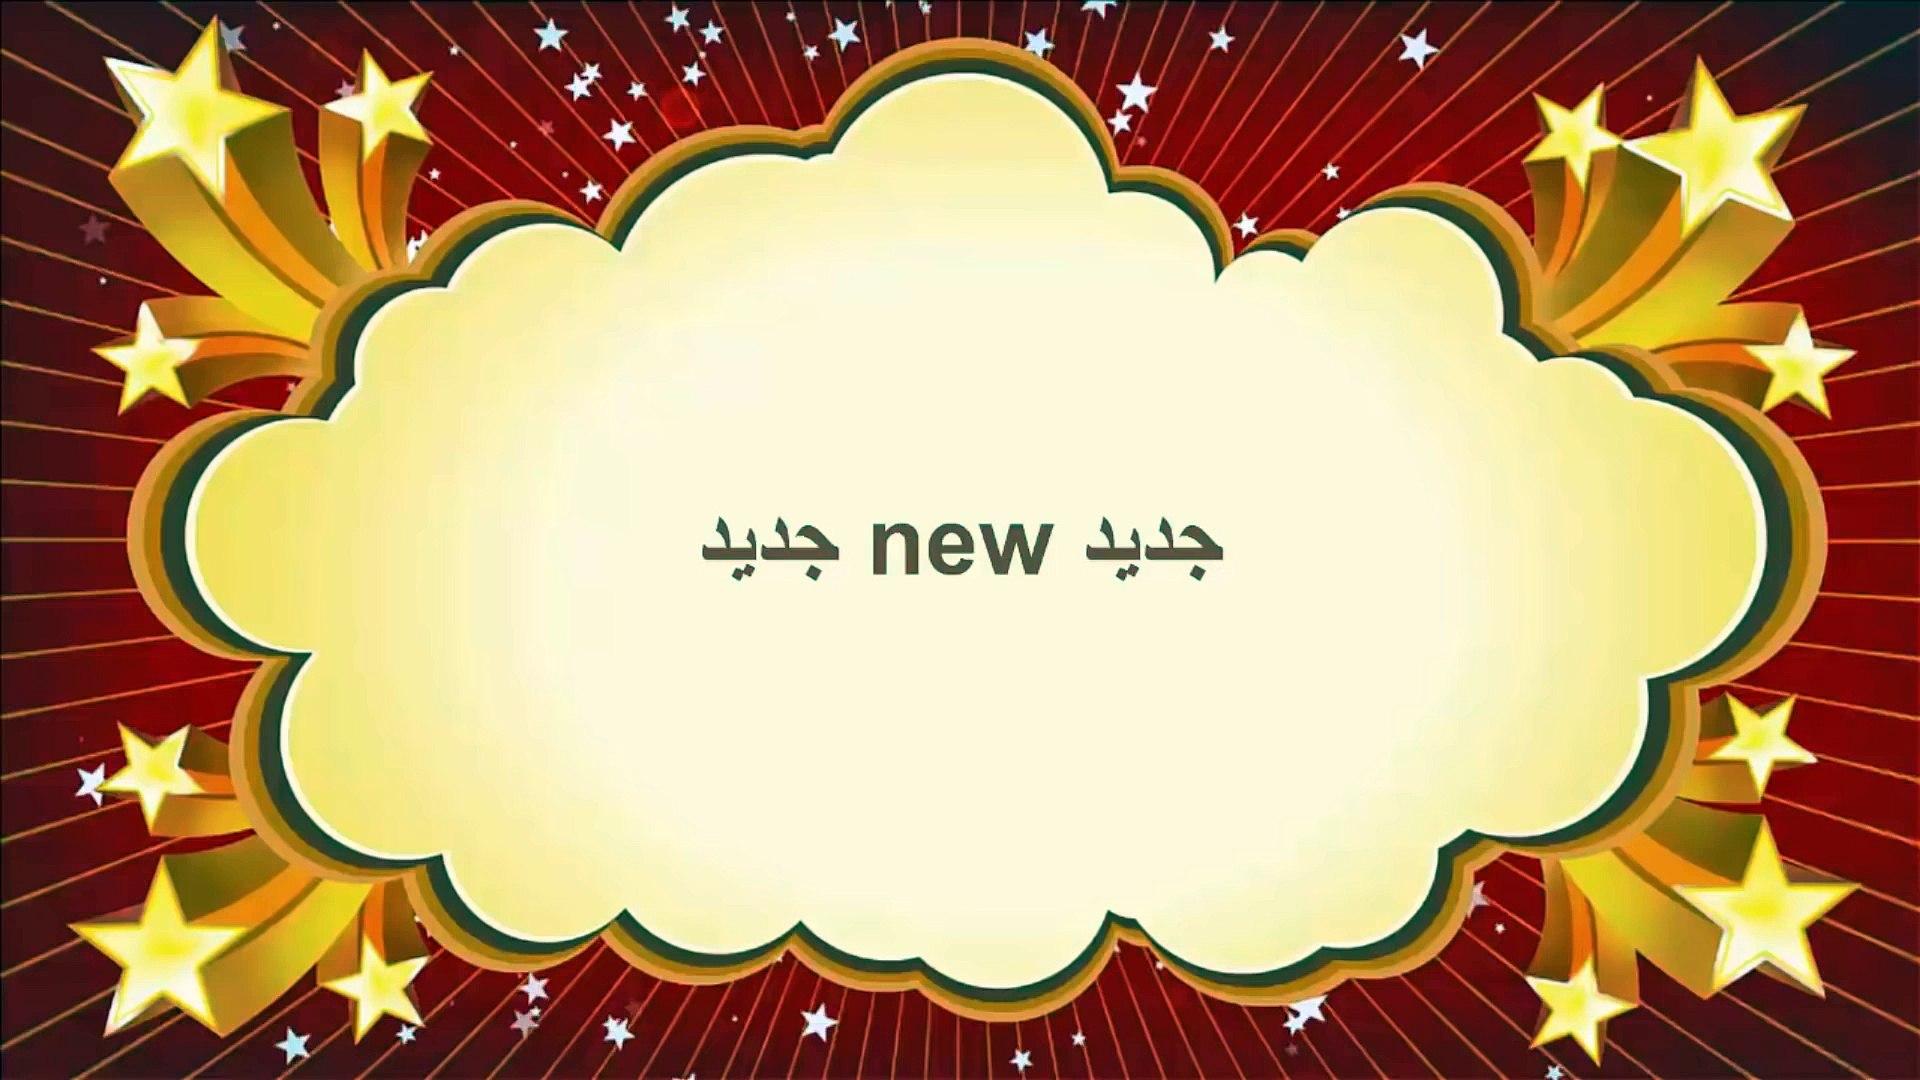 arab keek dance 2015 ◘ رقص بنات كييك .. رقص شرقي